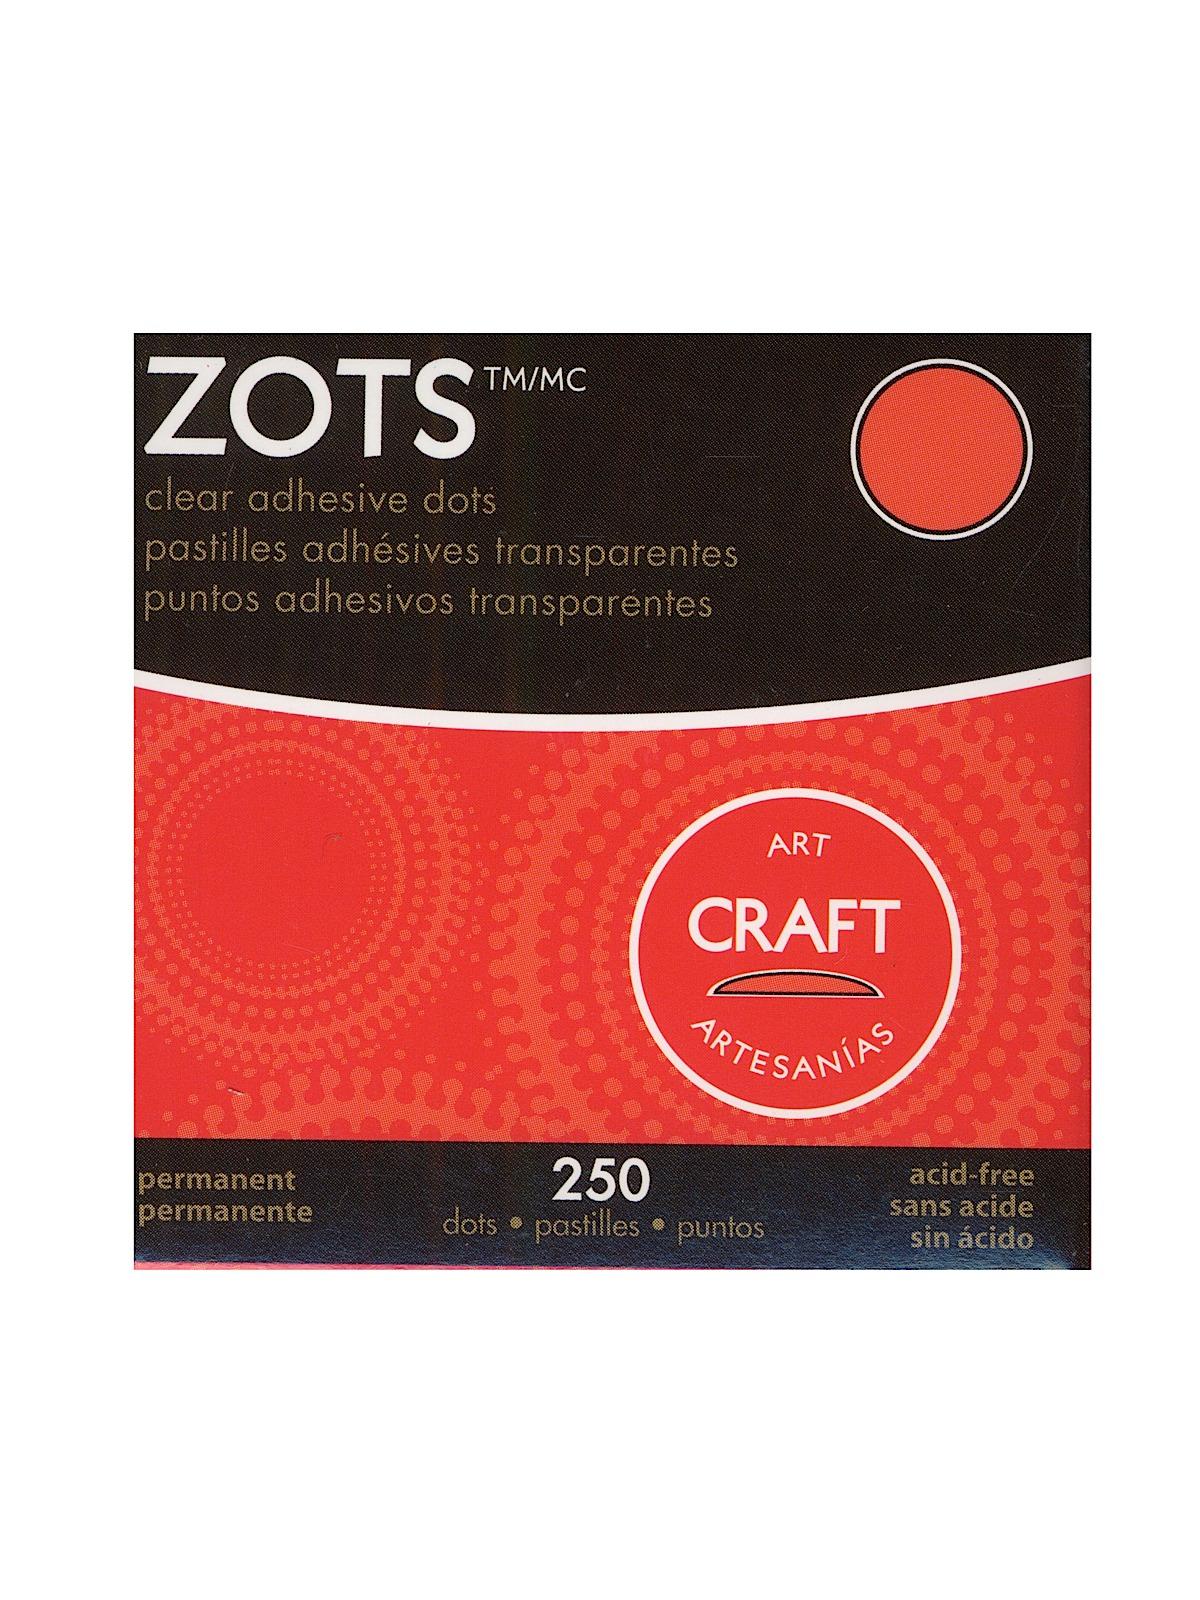 Zots Clear Adhesive Dots